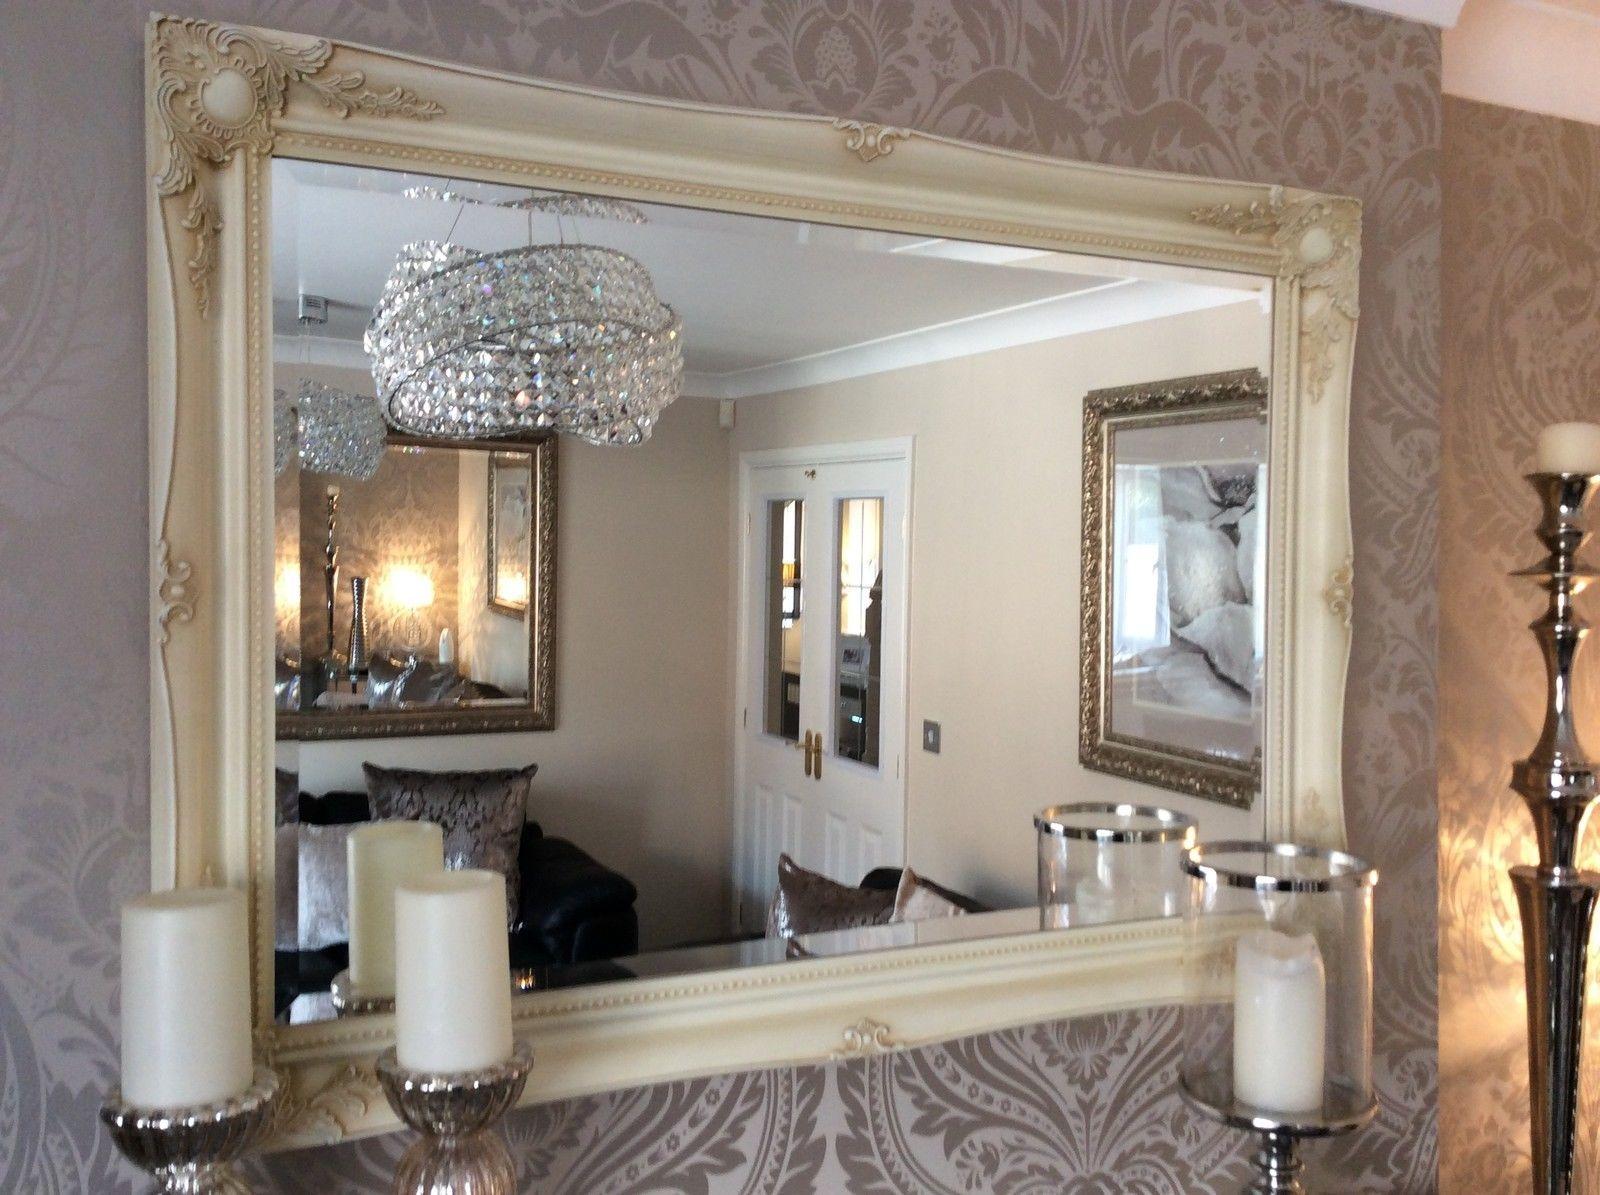 Cream Shabby Chic Wall Mirror Cream Shabby Chic Wall Mirror shab chic wall mirror harpsoundsco 1600 X 1195